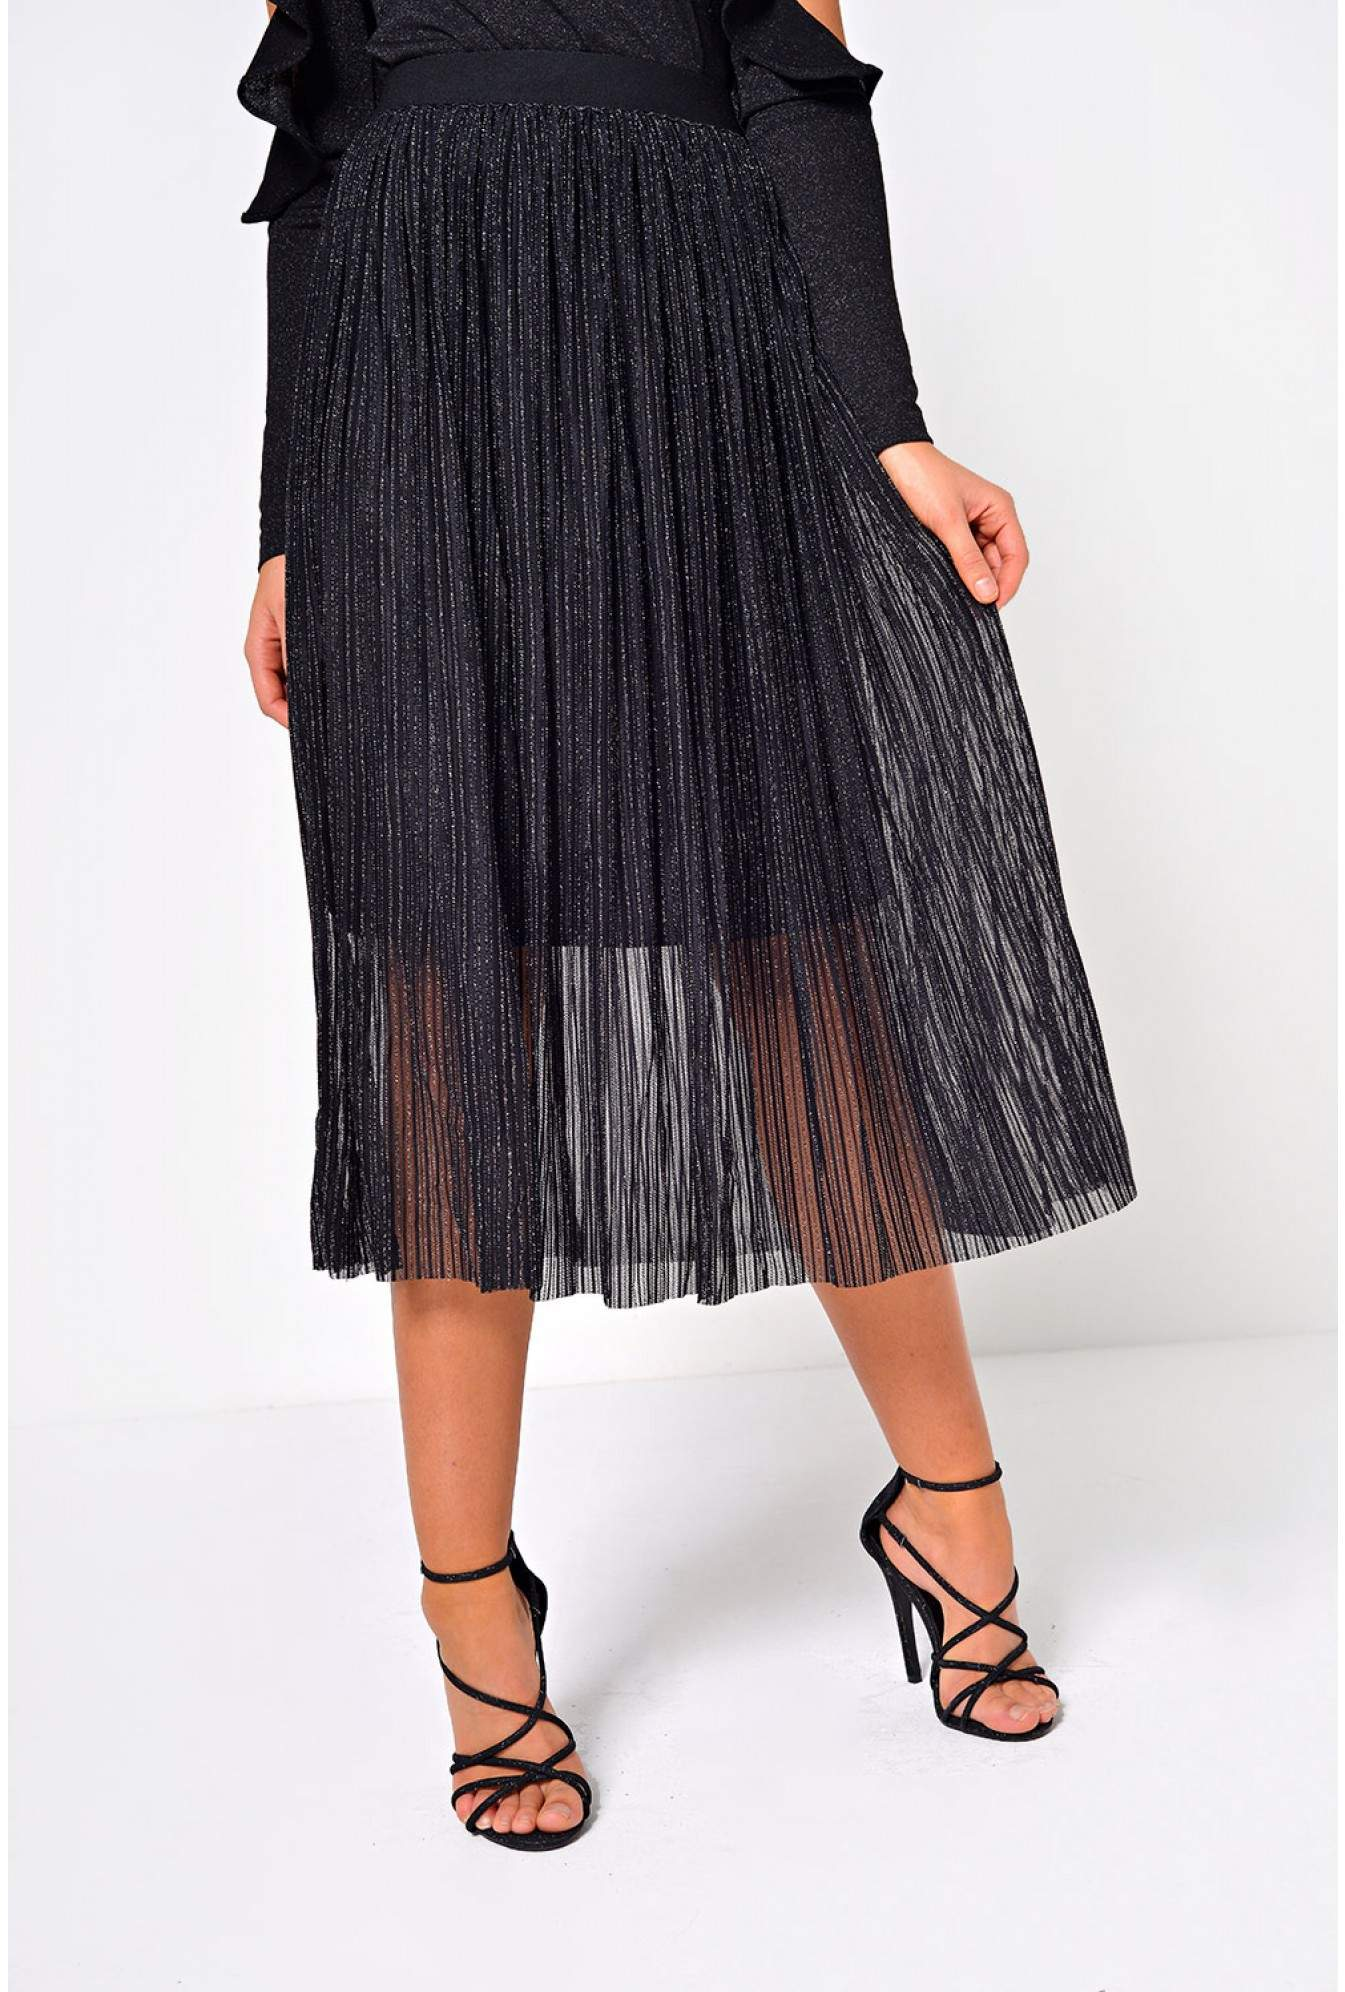 5617a8764f Stella Callie Metallic Thread Skirt in Black | iCLOTHING